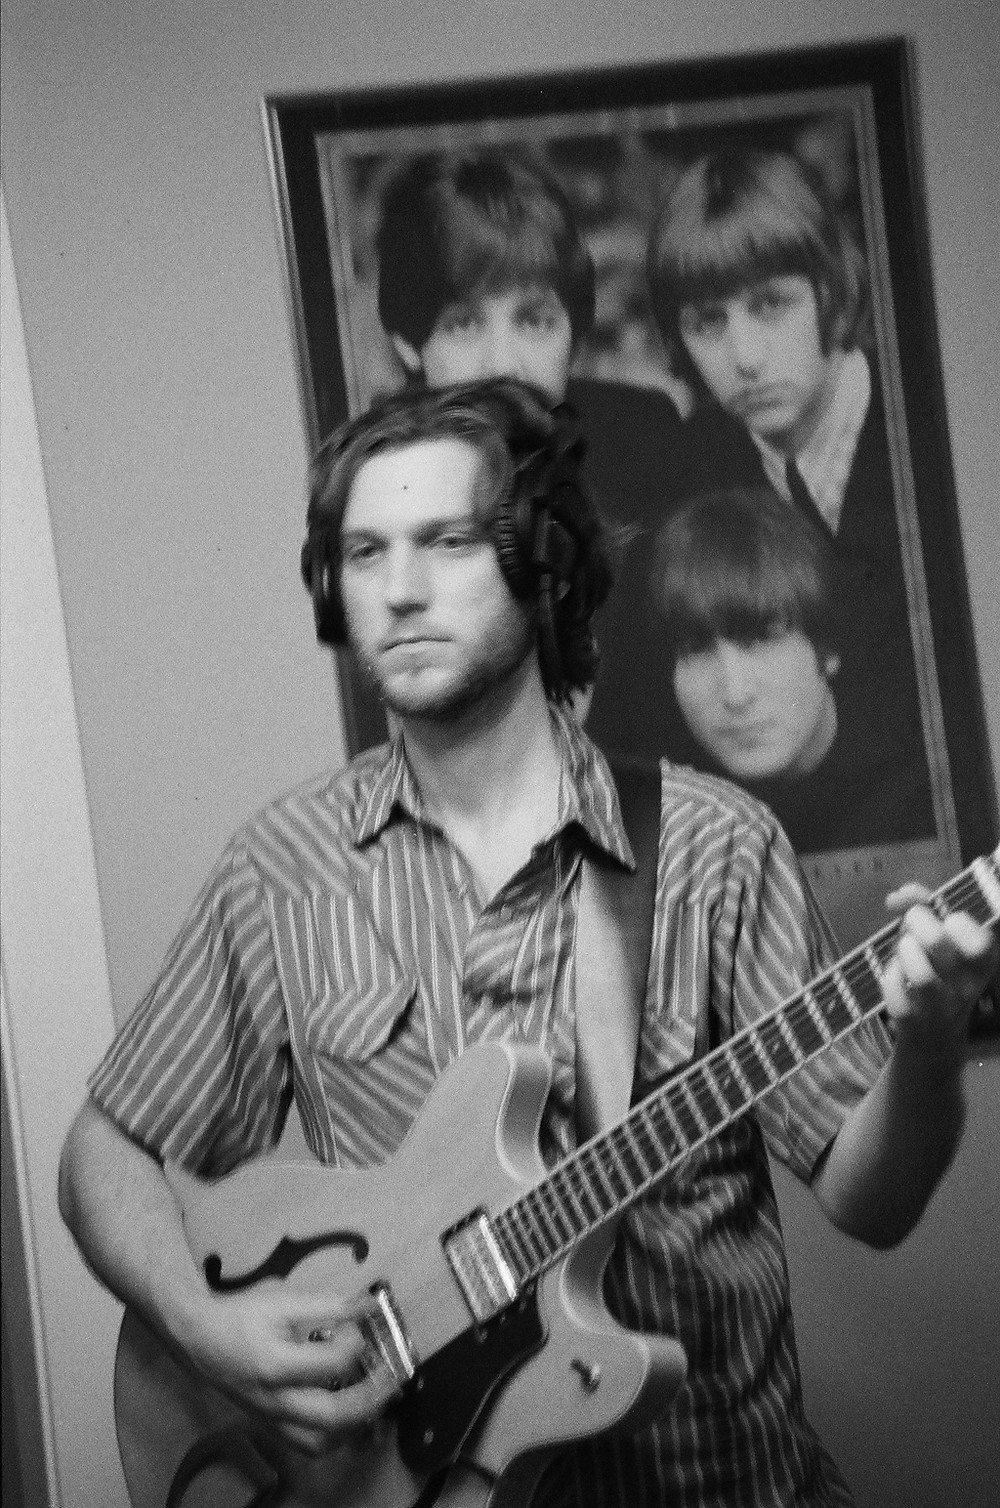 Scott, 2009, The Beatles